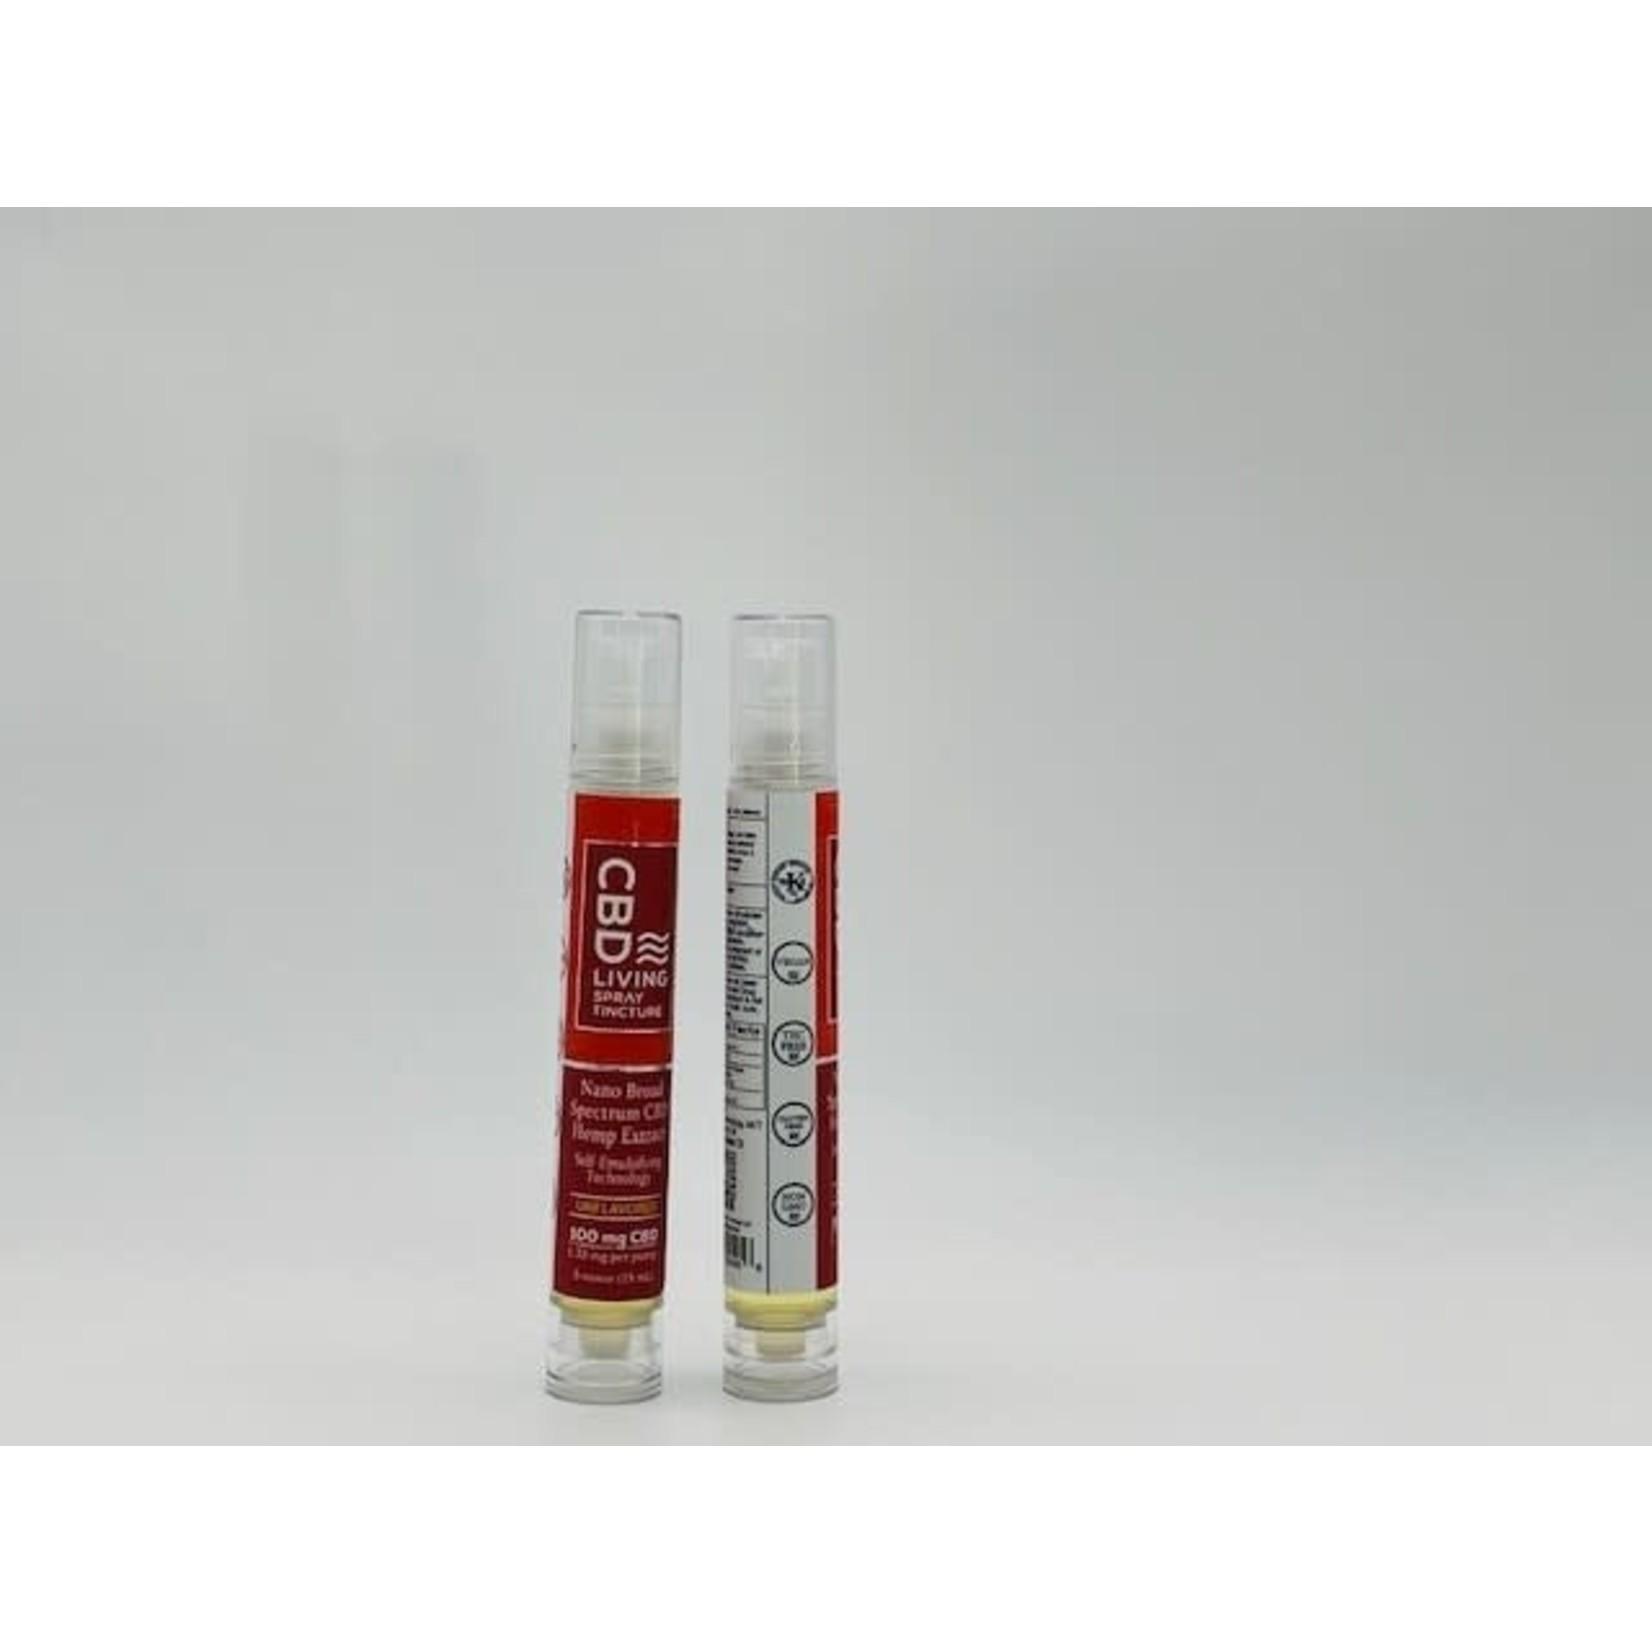 CBD Living CBDL Tincture Spray Unflavored 100mg